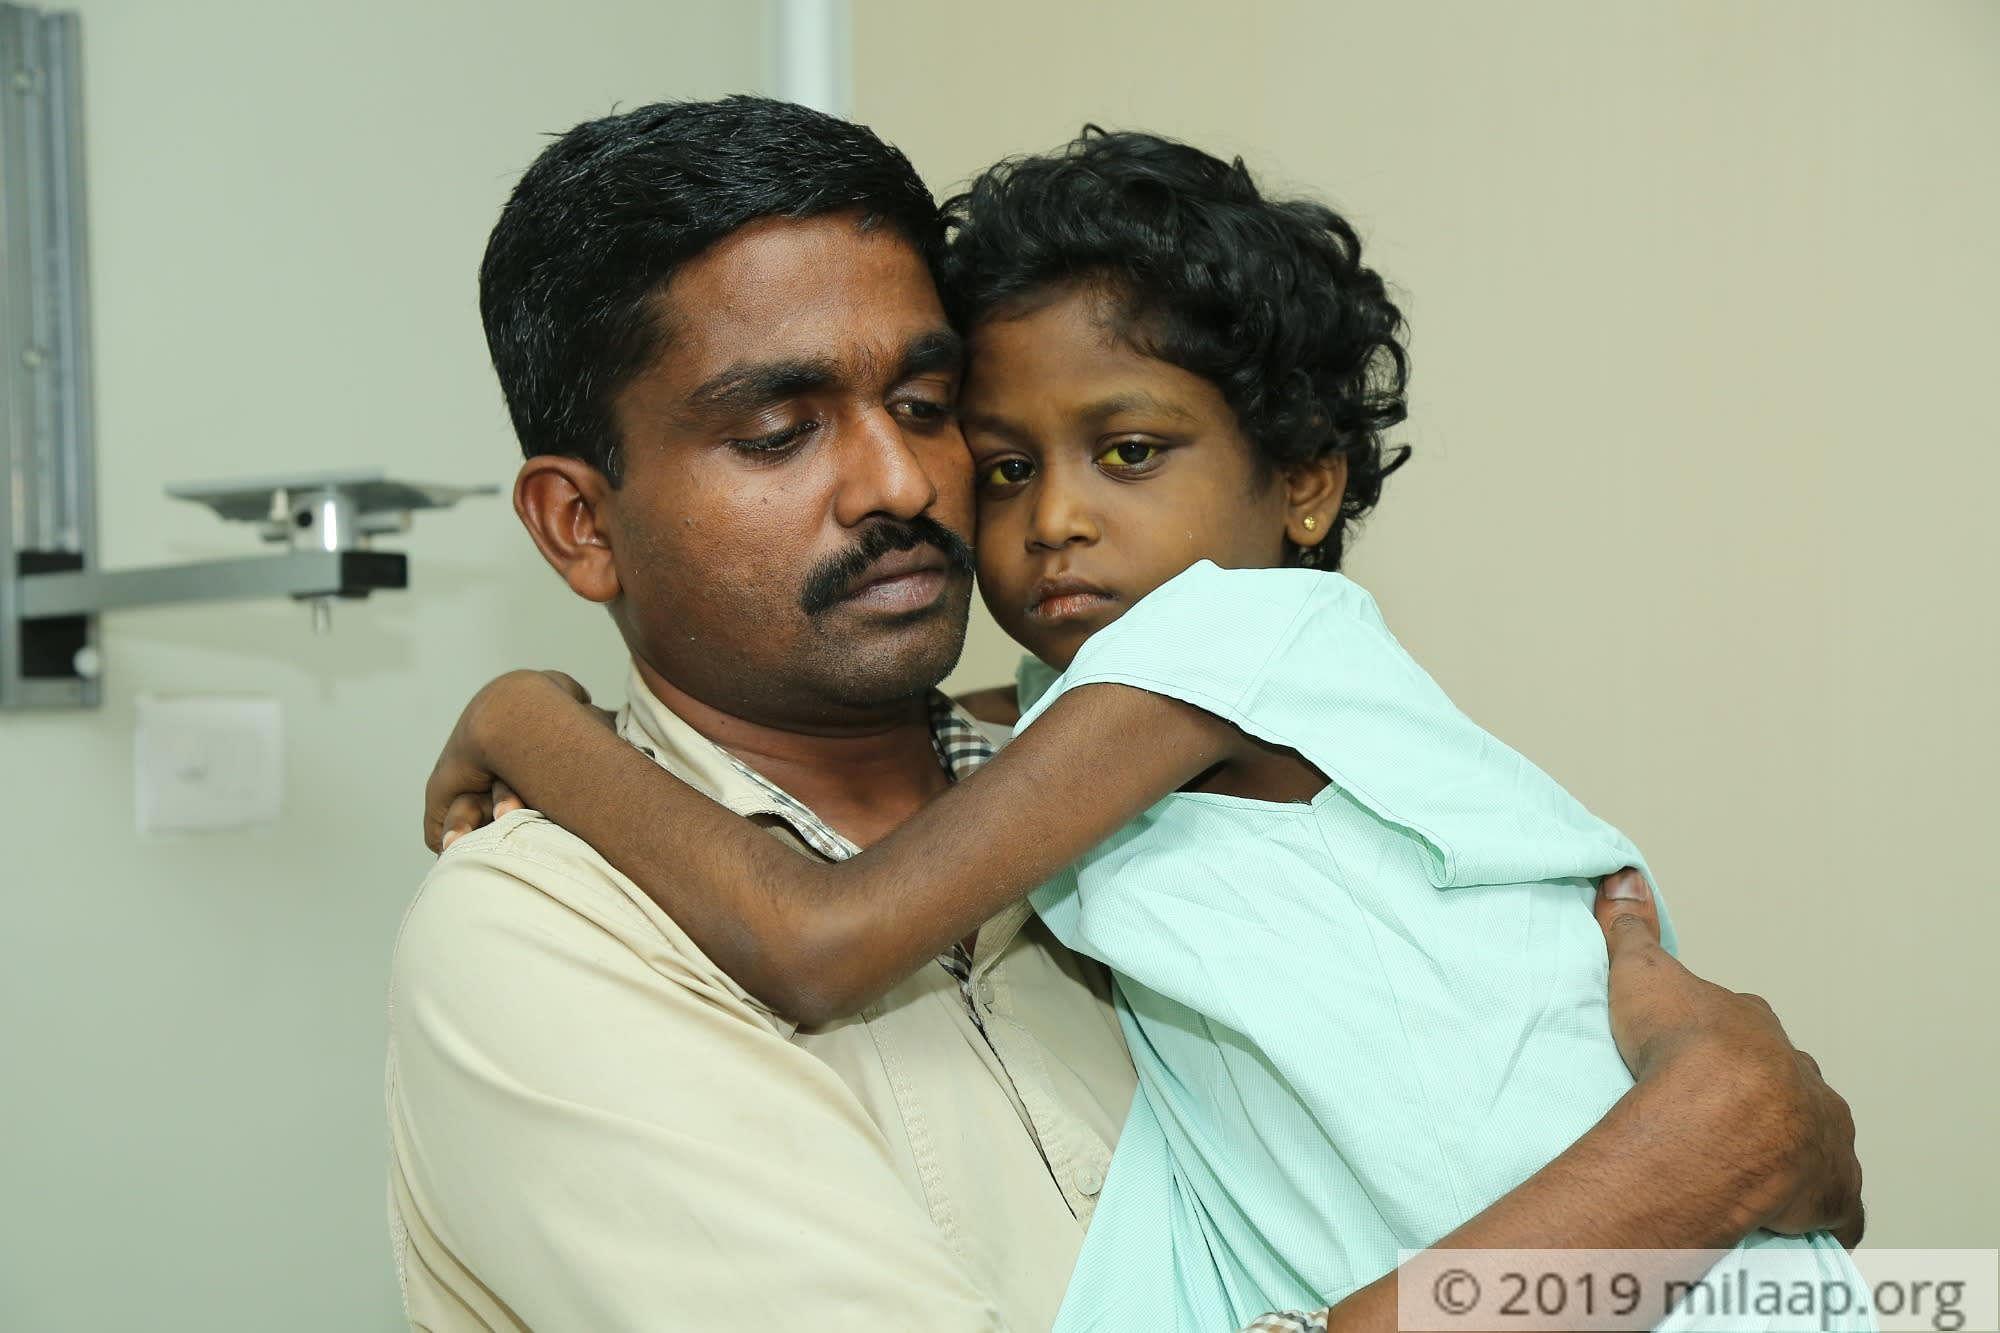 Sri 0691 bx94as 1568621590 lncsnb 1569326976